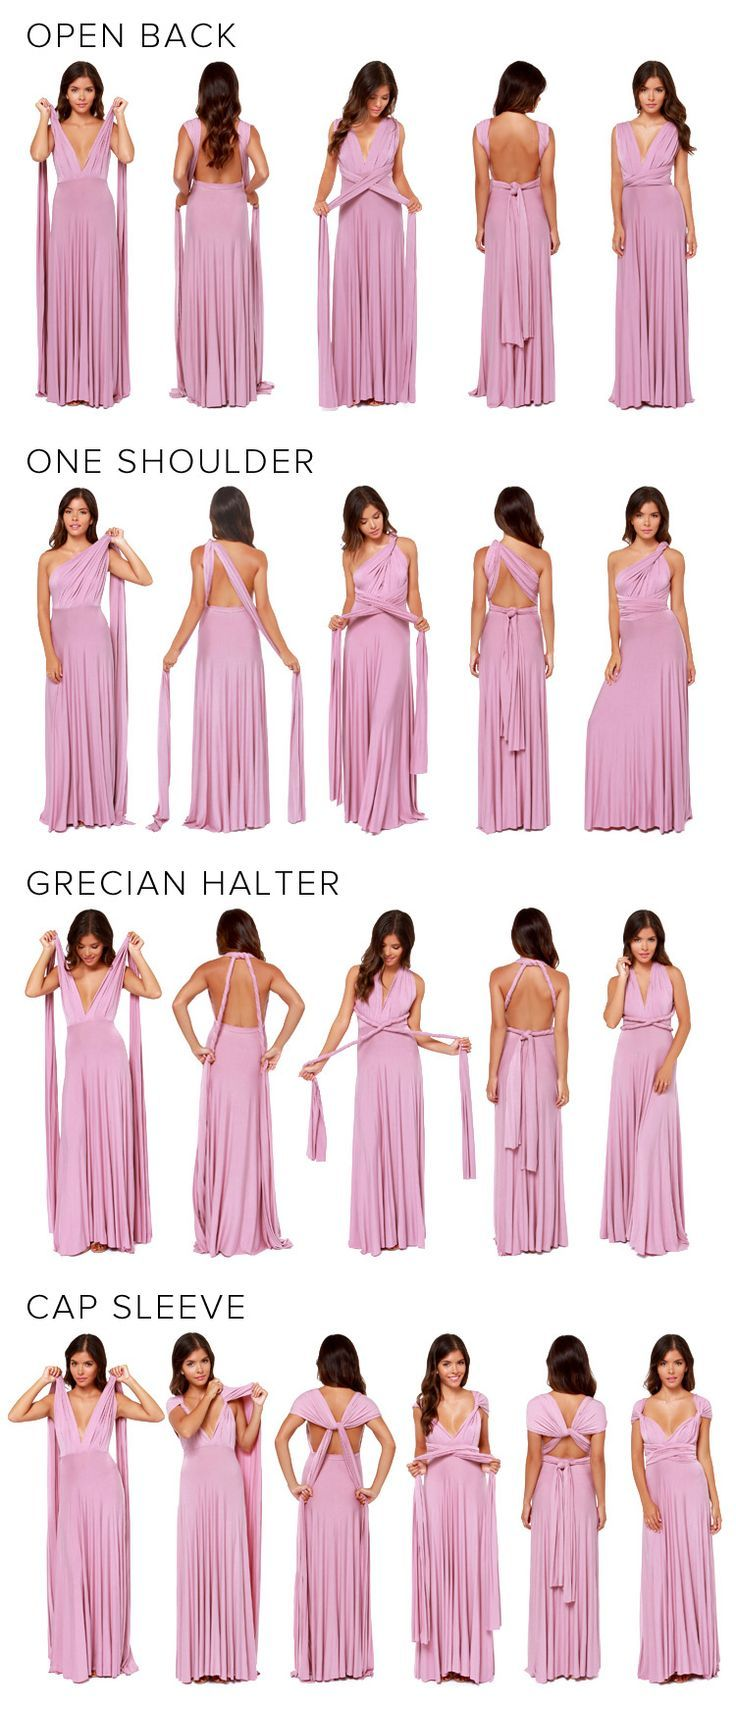 4 façons de porter cette robe | Costuras | Pinterest | Costura ...